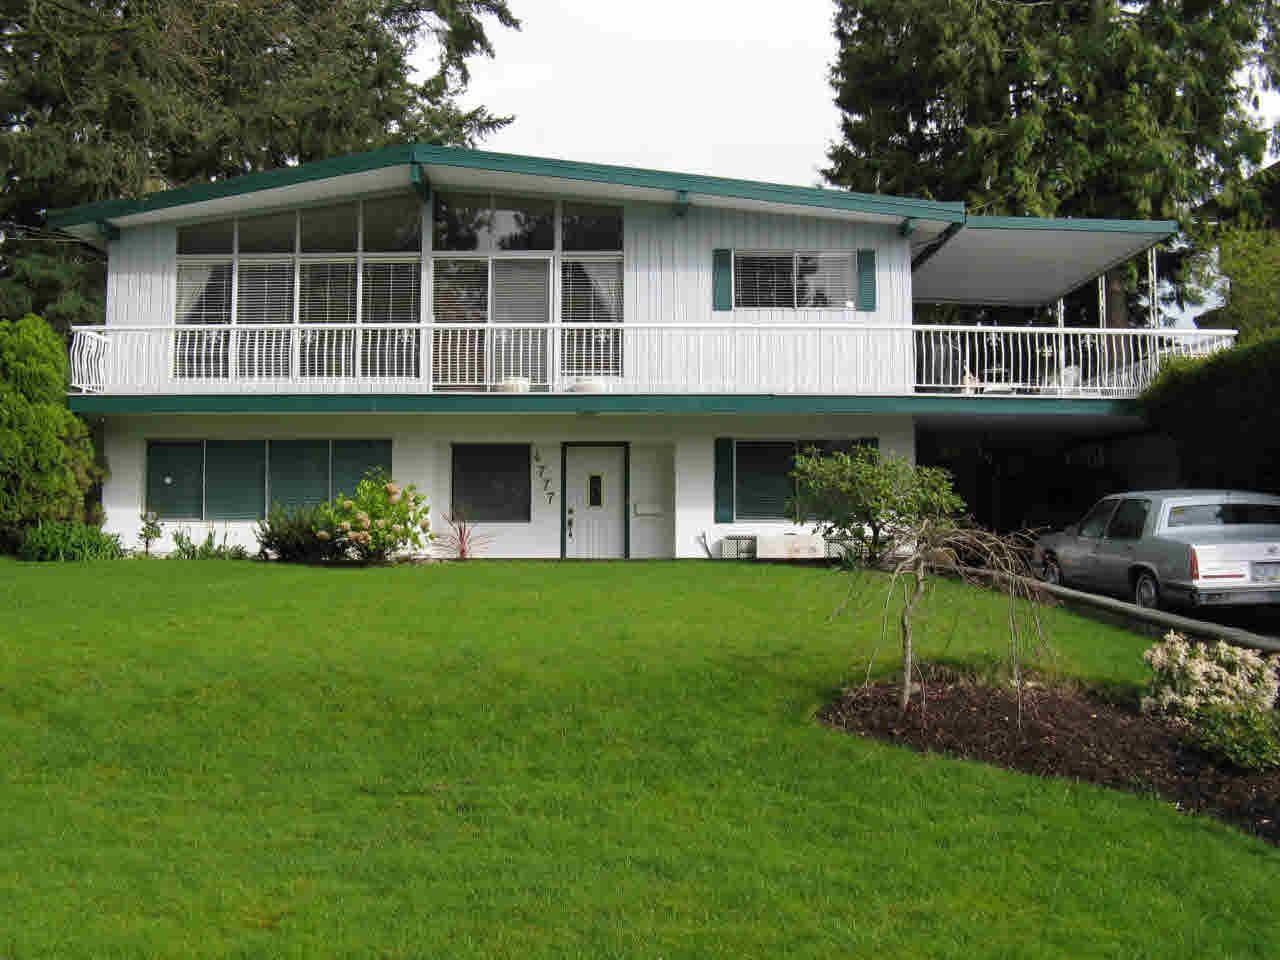 Main Photo: 4777 NEVILLE STREET in : South Slope House for sale : MLS®# V818996